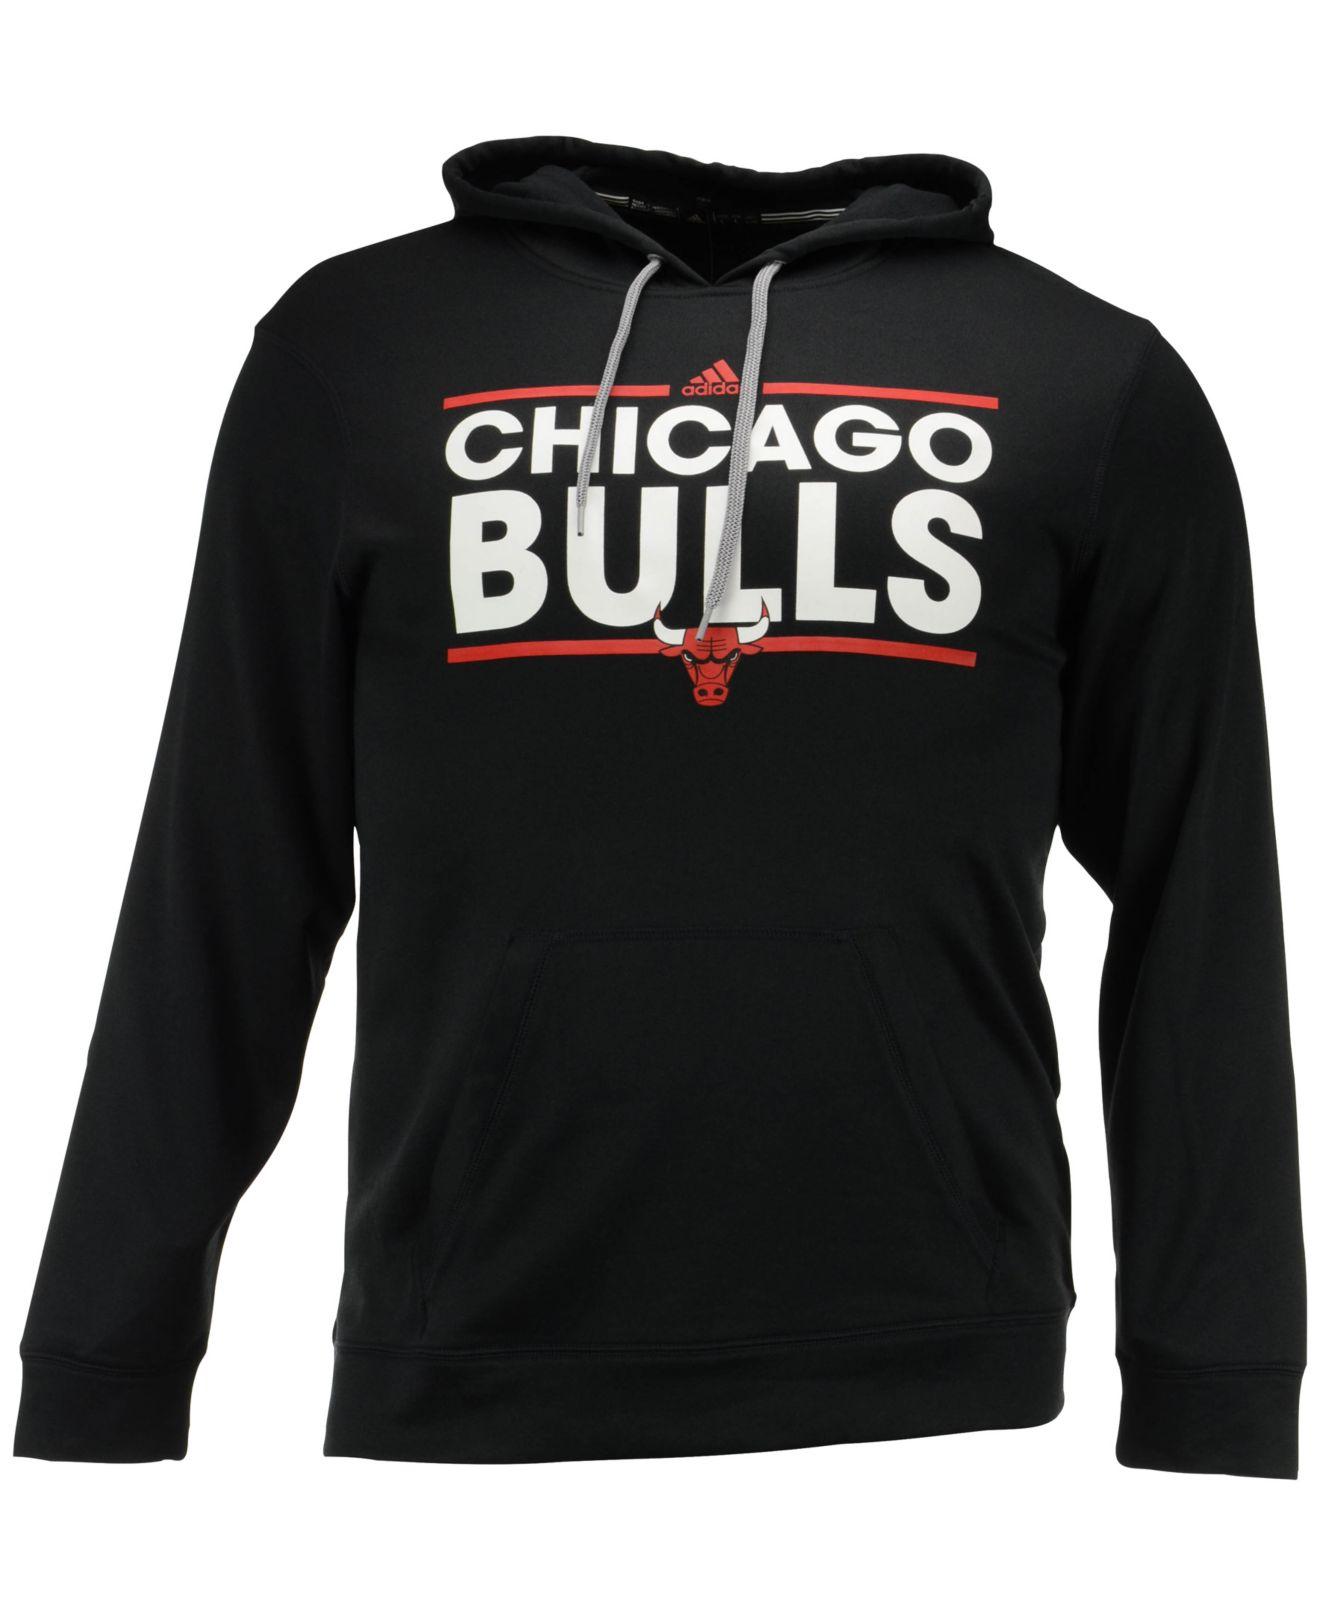 Lyst - Adidas Men s Chicago Bulls Dassler Hoodie in Black for Men 31c20f4c3d37